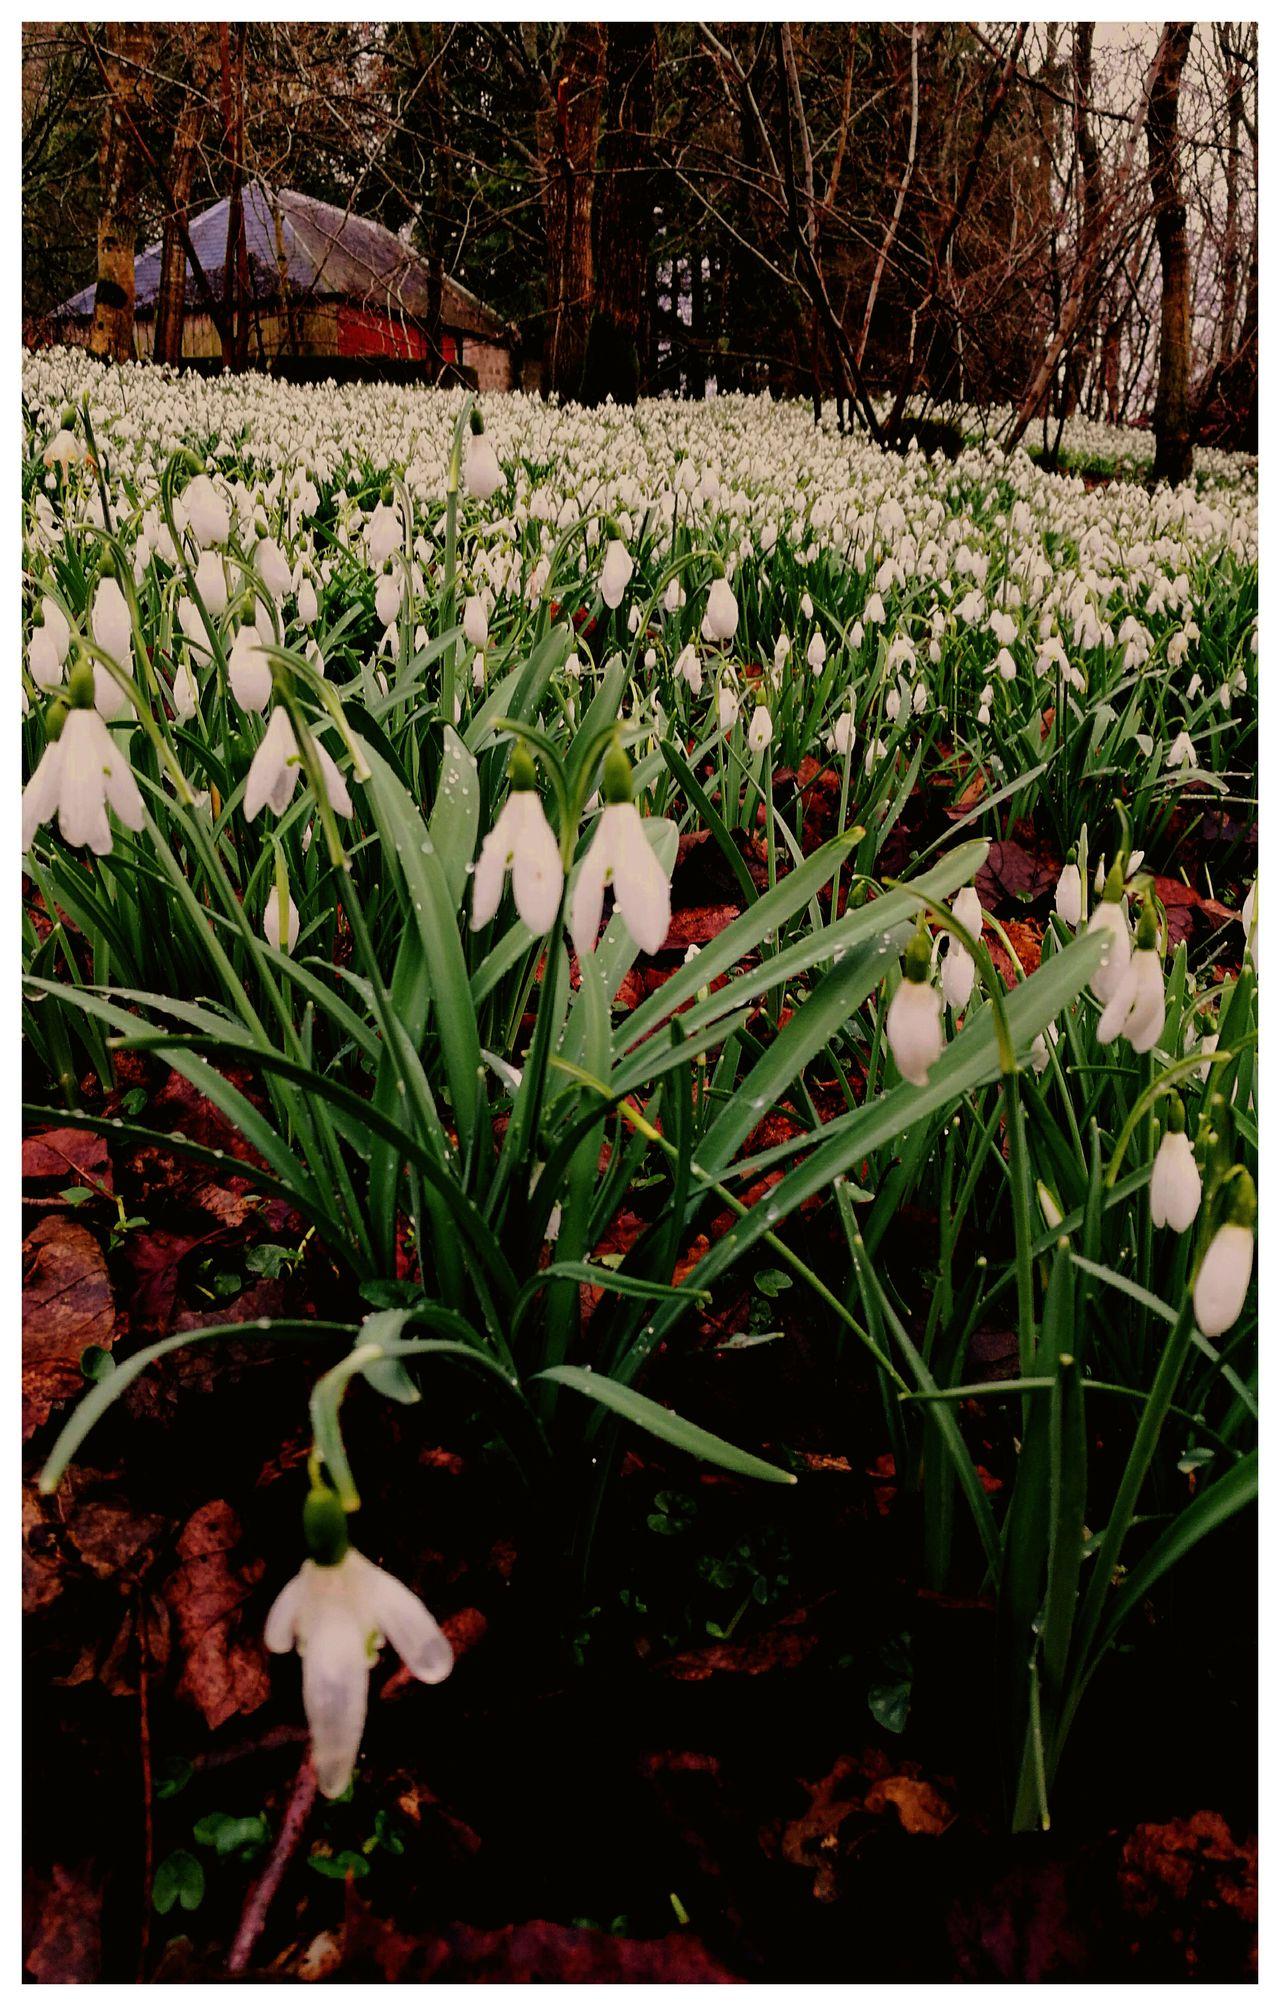 countryside woodland tree Snowdrops🌱 Abundance Of farmland estate Glamis Scotland Walksintheforest Spring Time seasonal